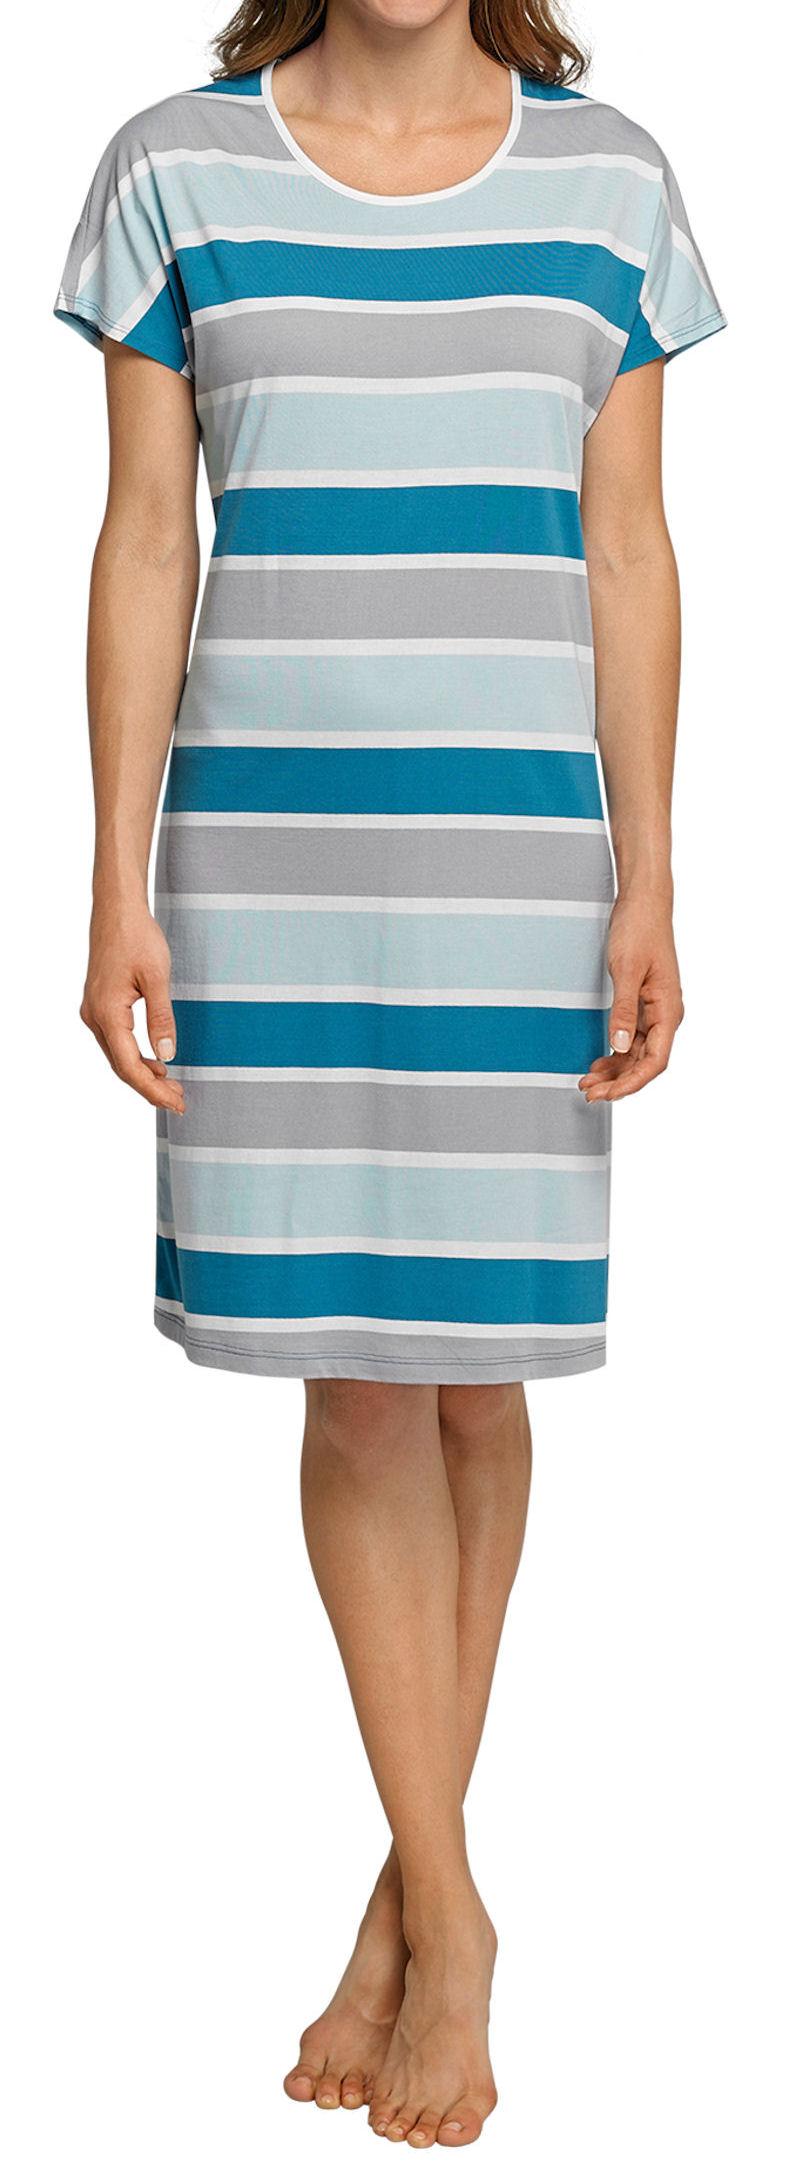 Schiesser Damen Nachthemd Sleepshirt 161043-526